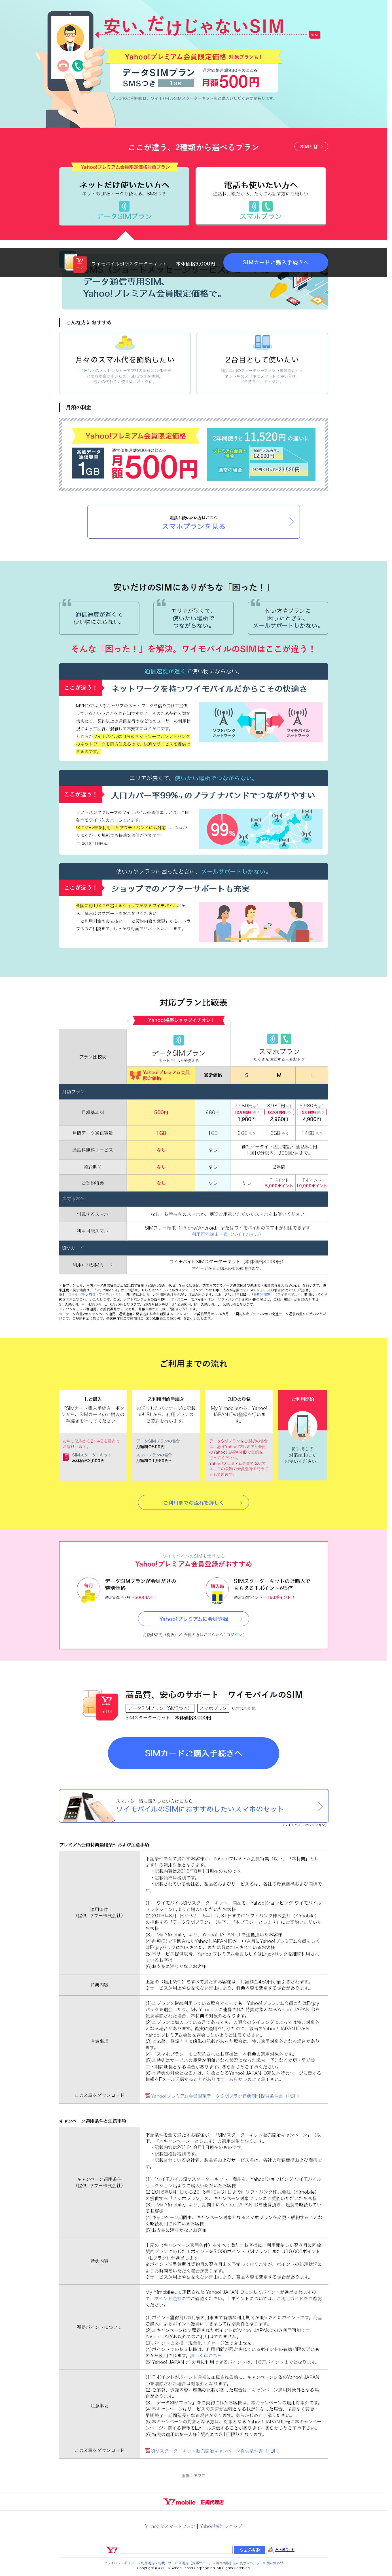 smartphone.yahoo.co.jp/ymobile/sim/